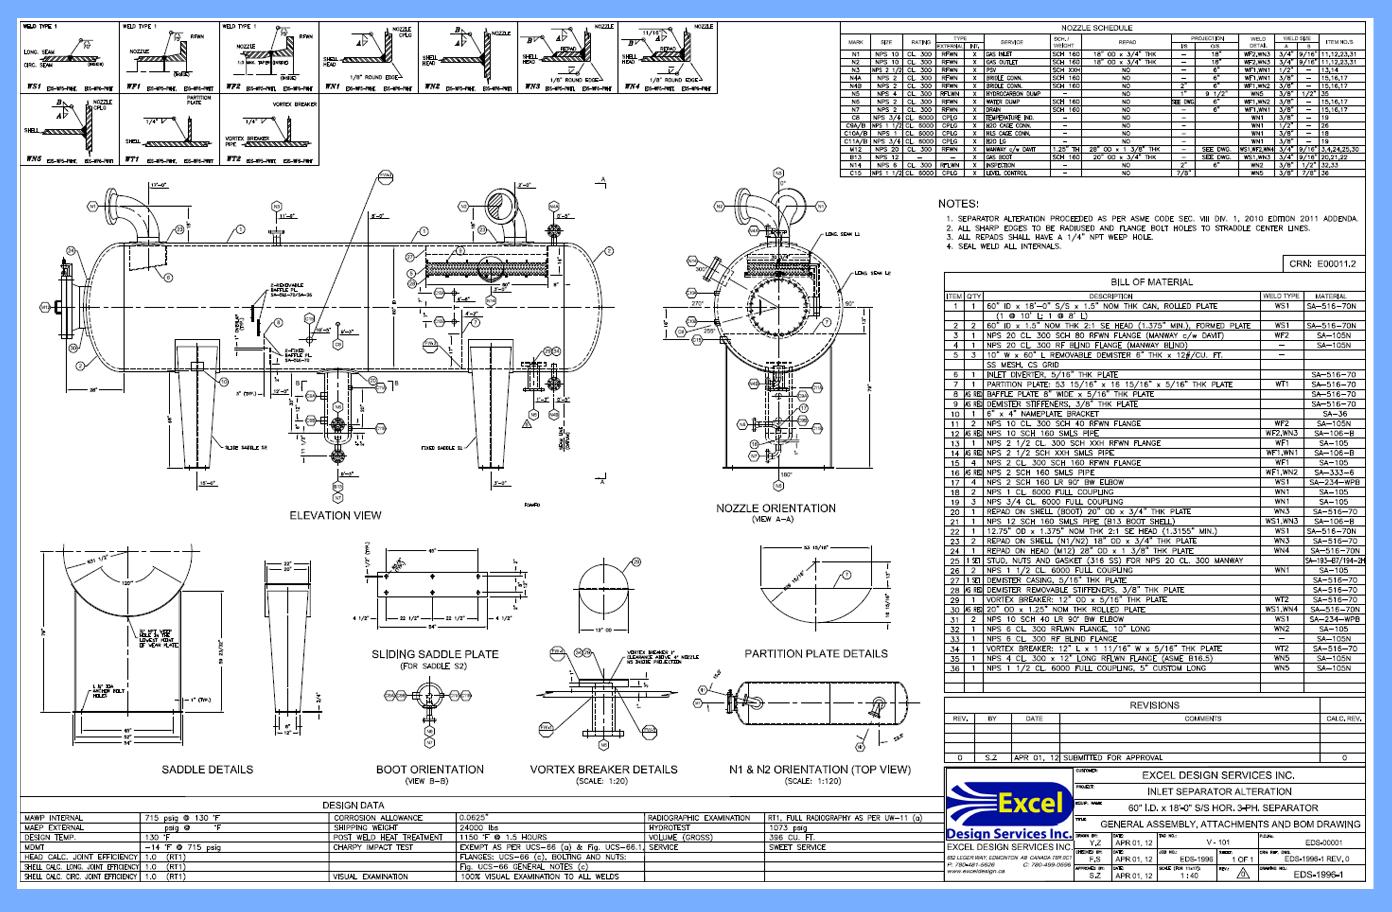 Excel Spreadsheet Design Service Inside Engineering Design